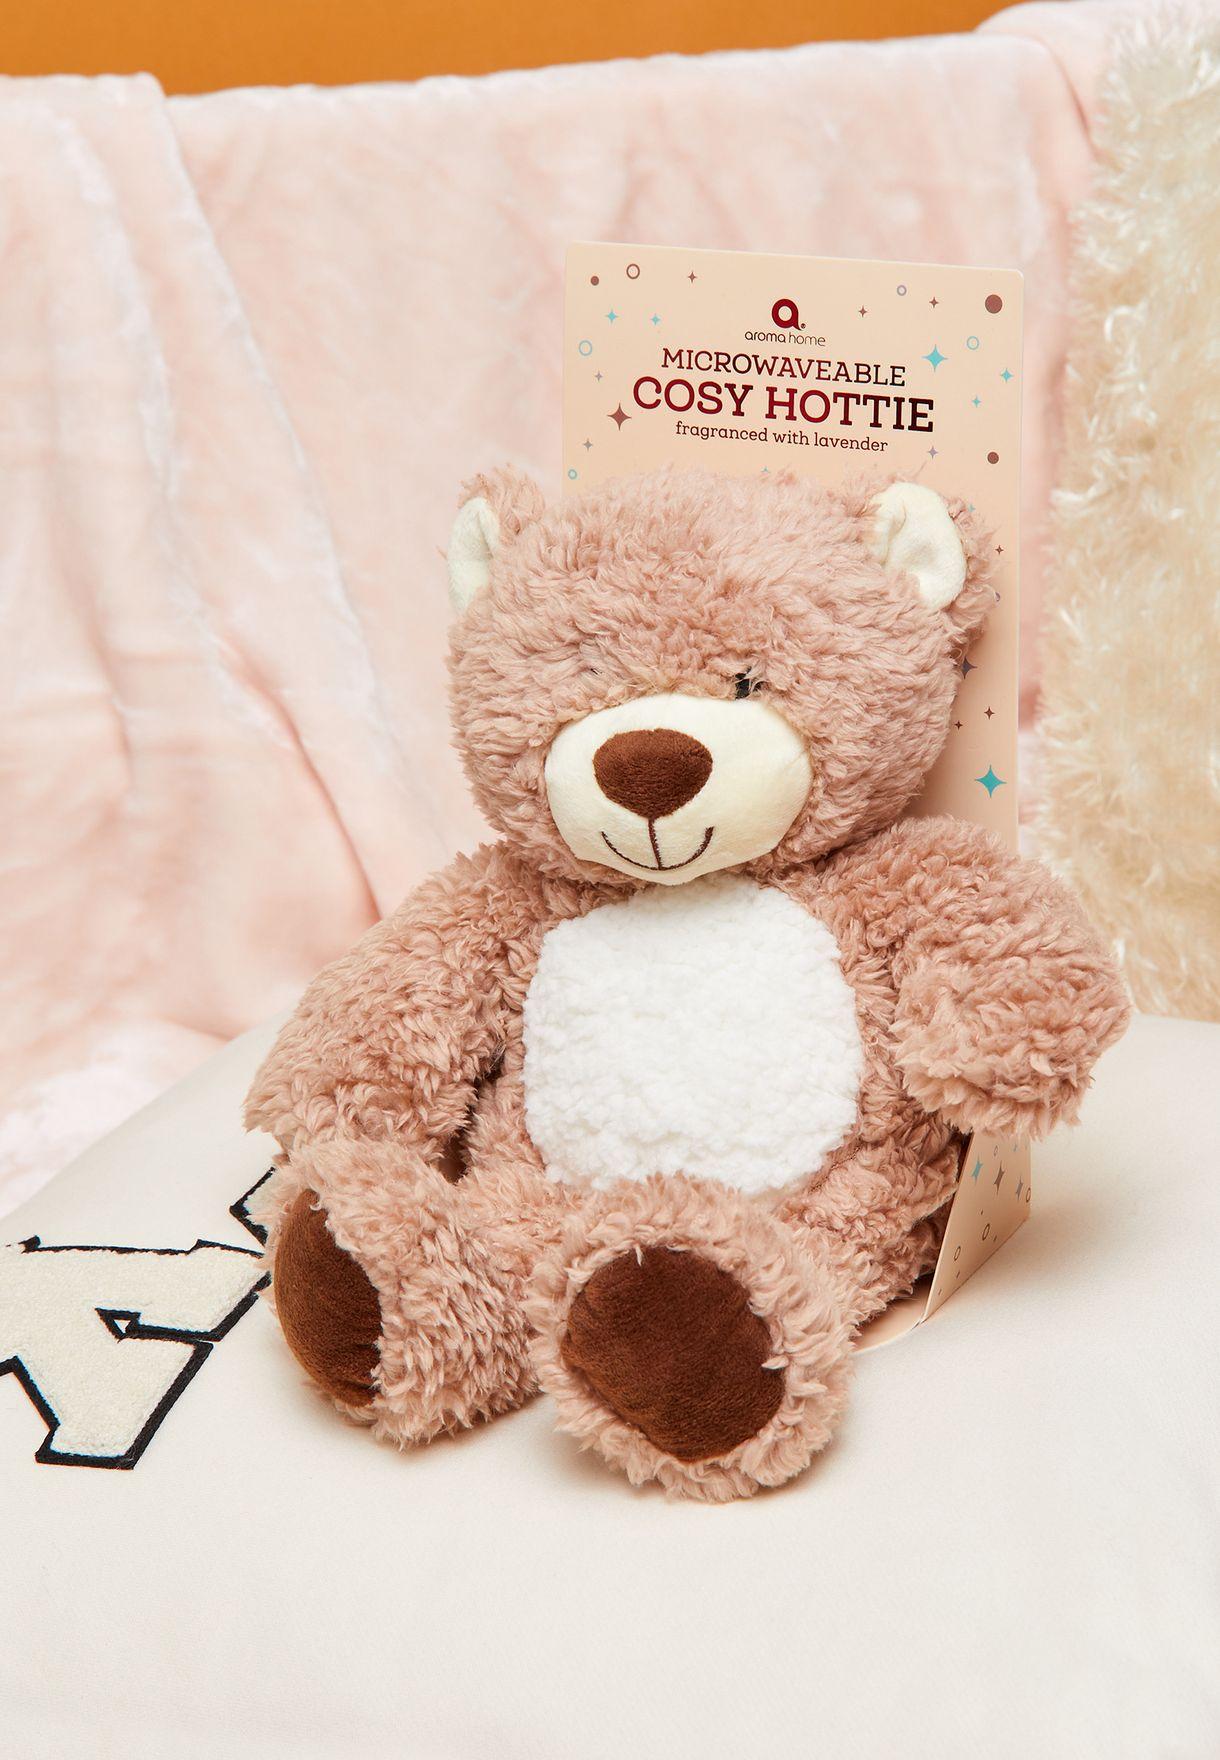 Cozy Bear Microwave Hottie